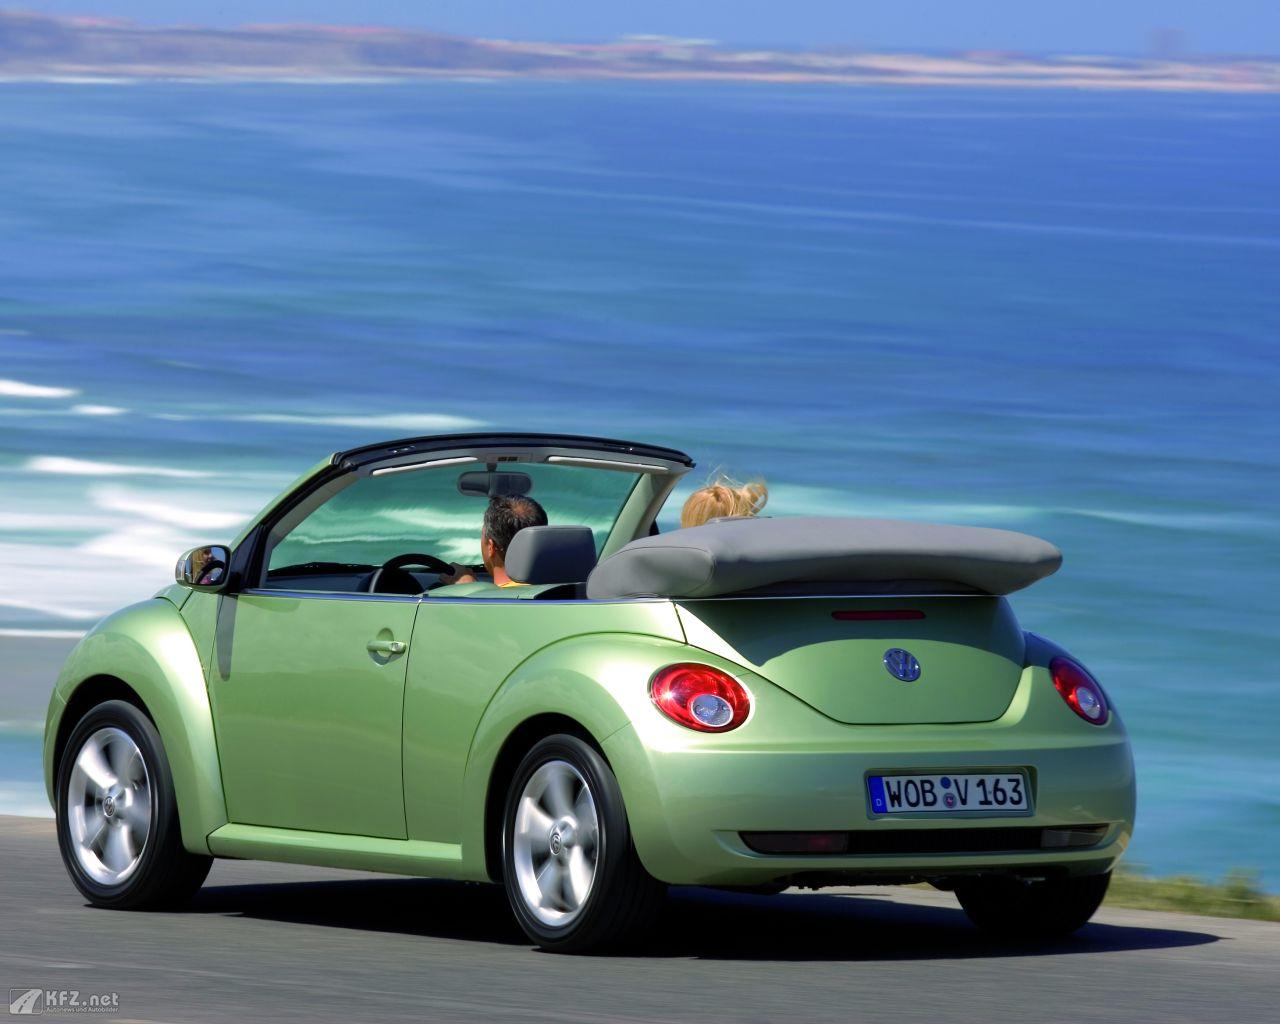 vw-beetle-1280x1024-14